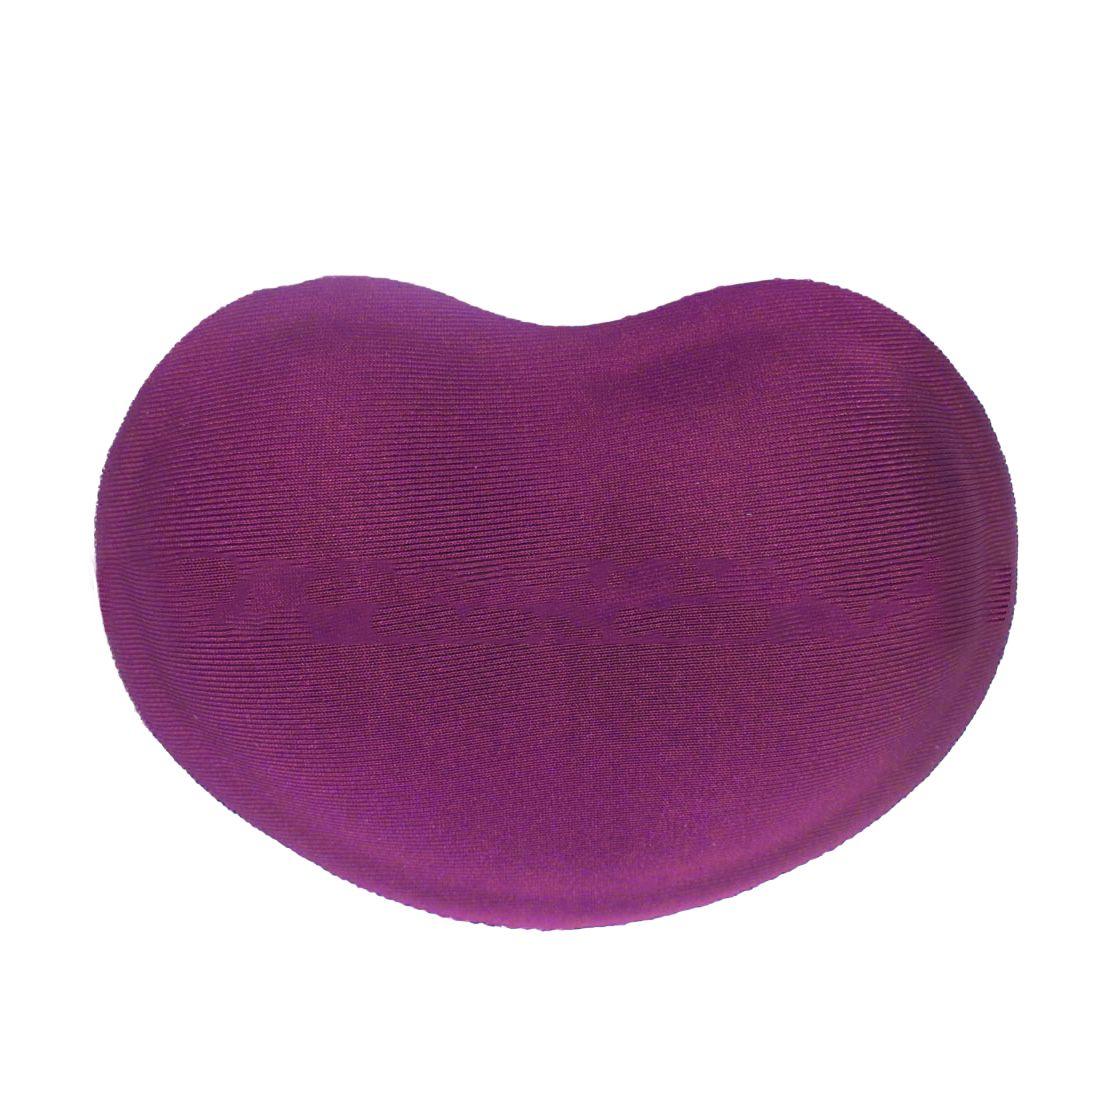 Etmakit Good Sale Heart-shaped Comfort 3D Wrist Rest Silica Gel Hand Pillow Memory Cotton Mouse Pad For Office